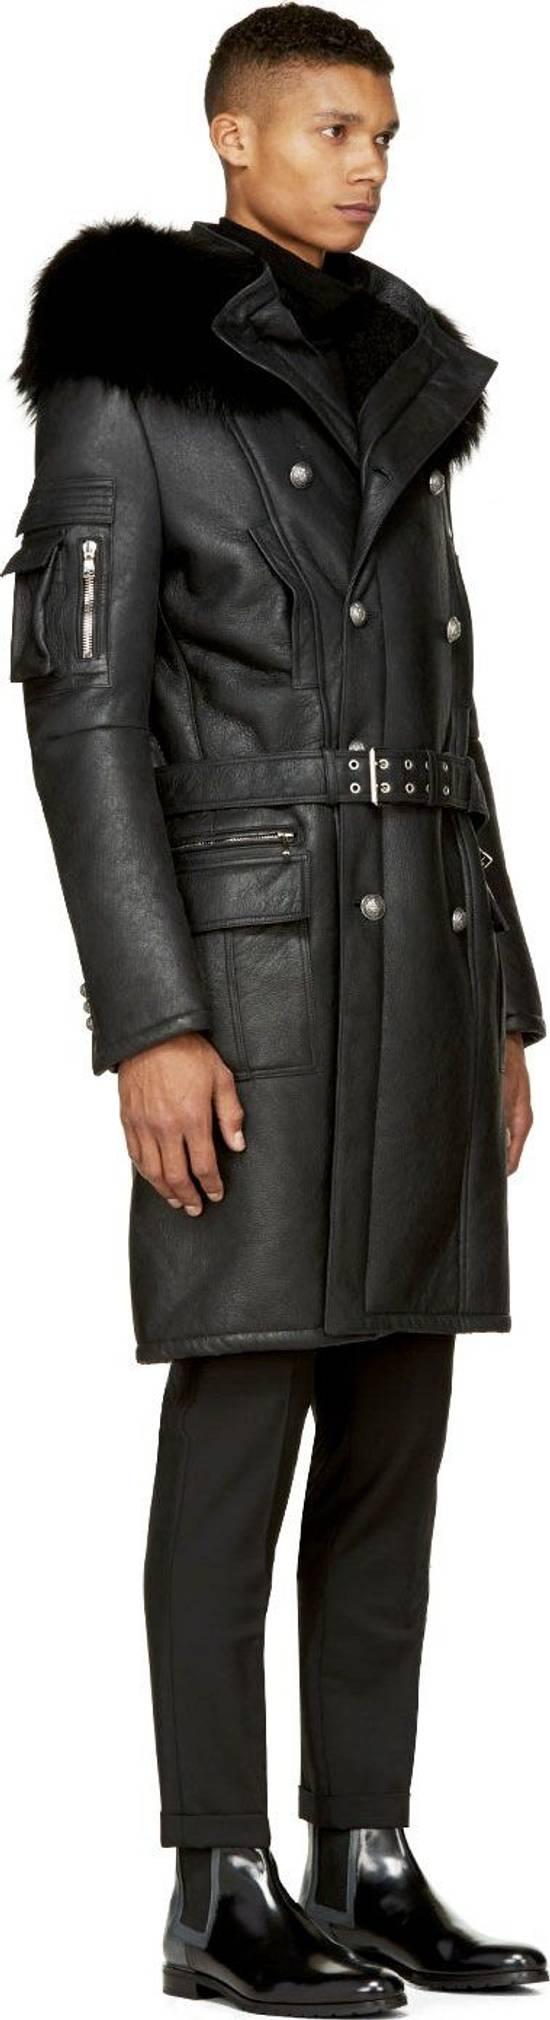 Balmain Balmain Leather Shearling Fur Parka Black Size Small 46-48 Coat Military Size US S / EU 44-46 / 1 - 2